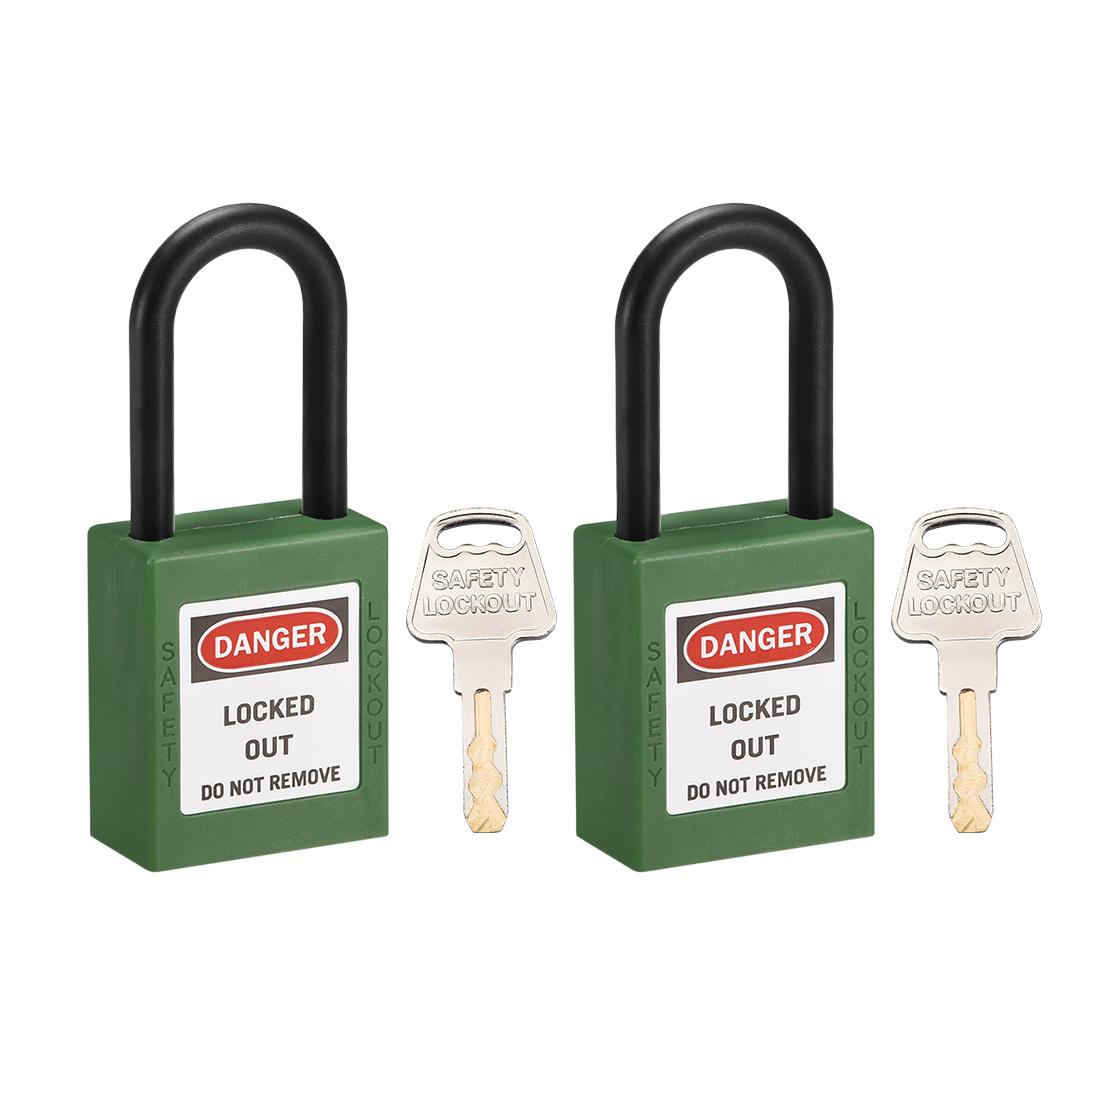 Lockout Tagout Locks, 1-1/2 Inch Shackle Key Alike Safety Padlock Green 2pcs